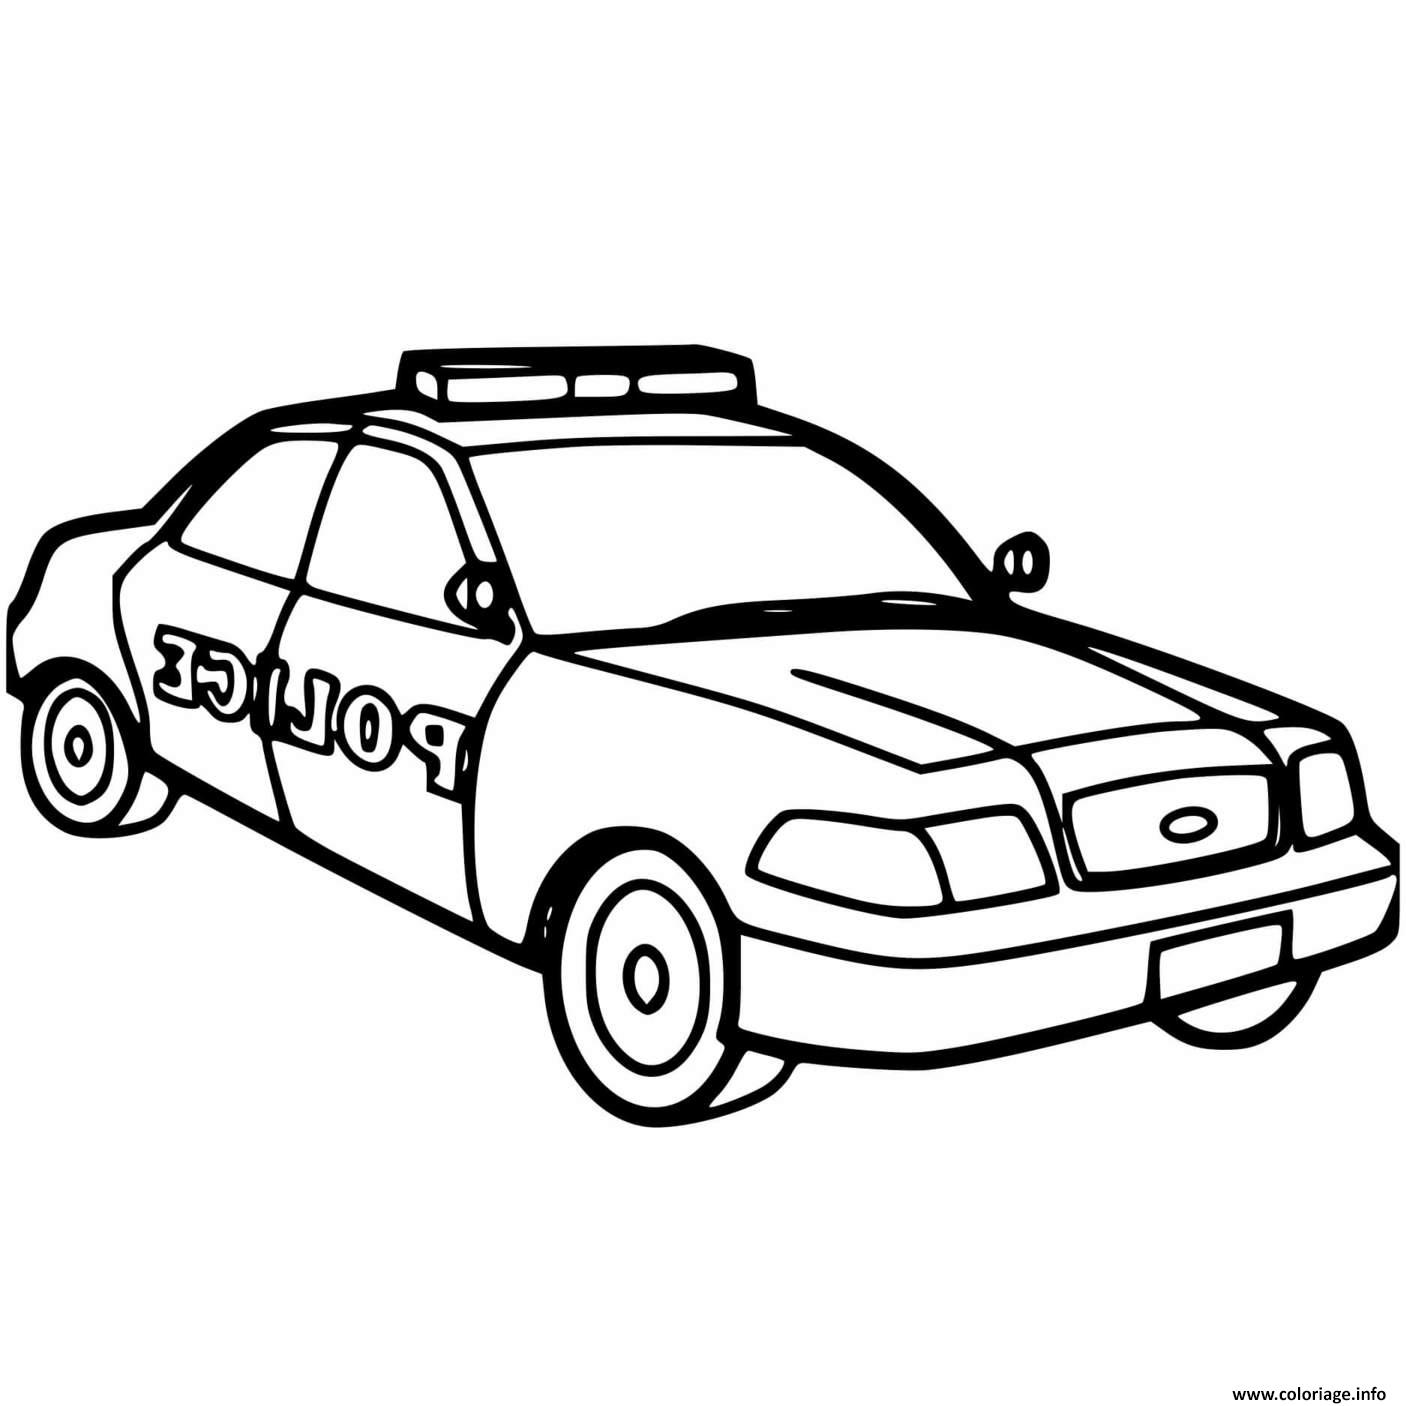 Coloriage Voiture De Police Maternelle Americaine Dessin Police A Imprimer